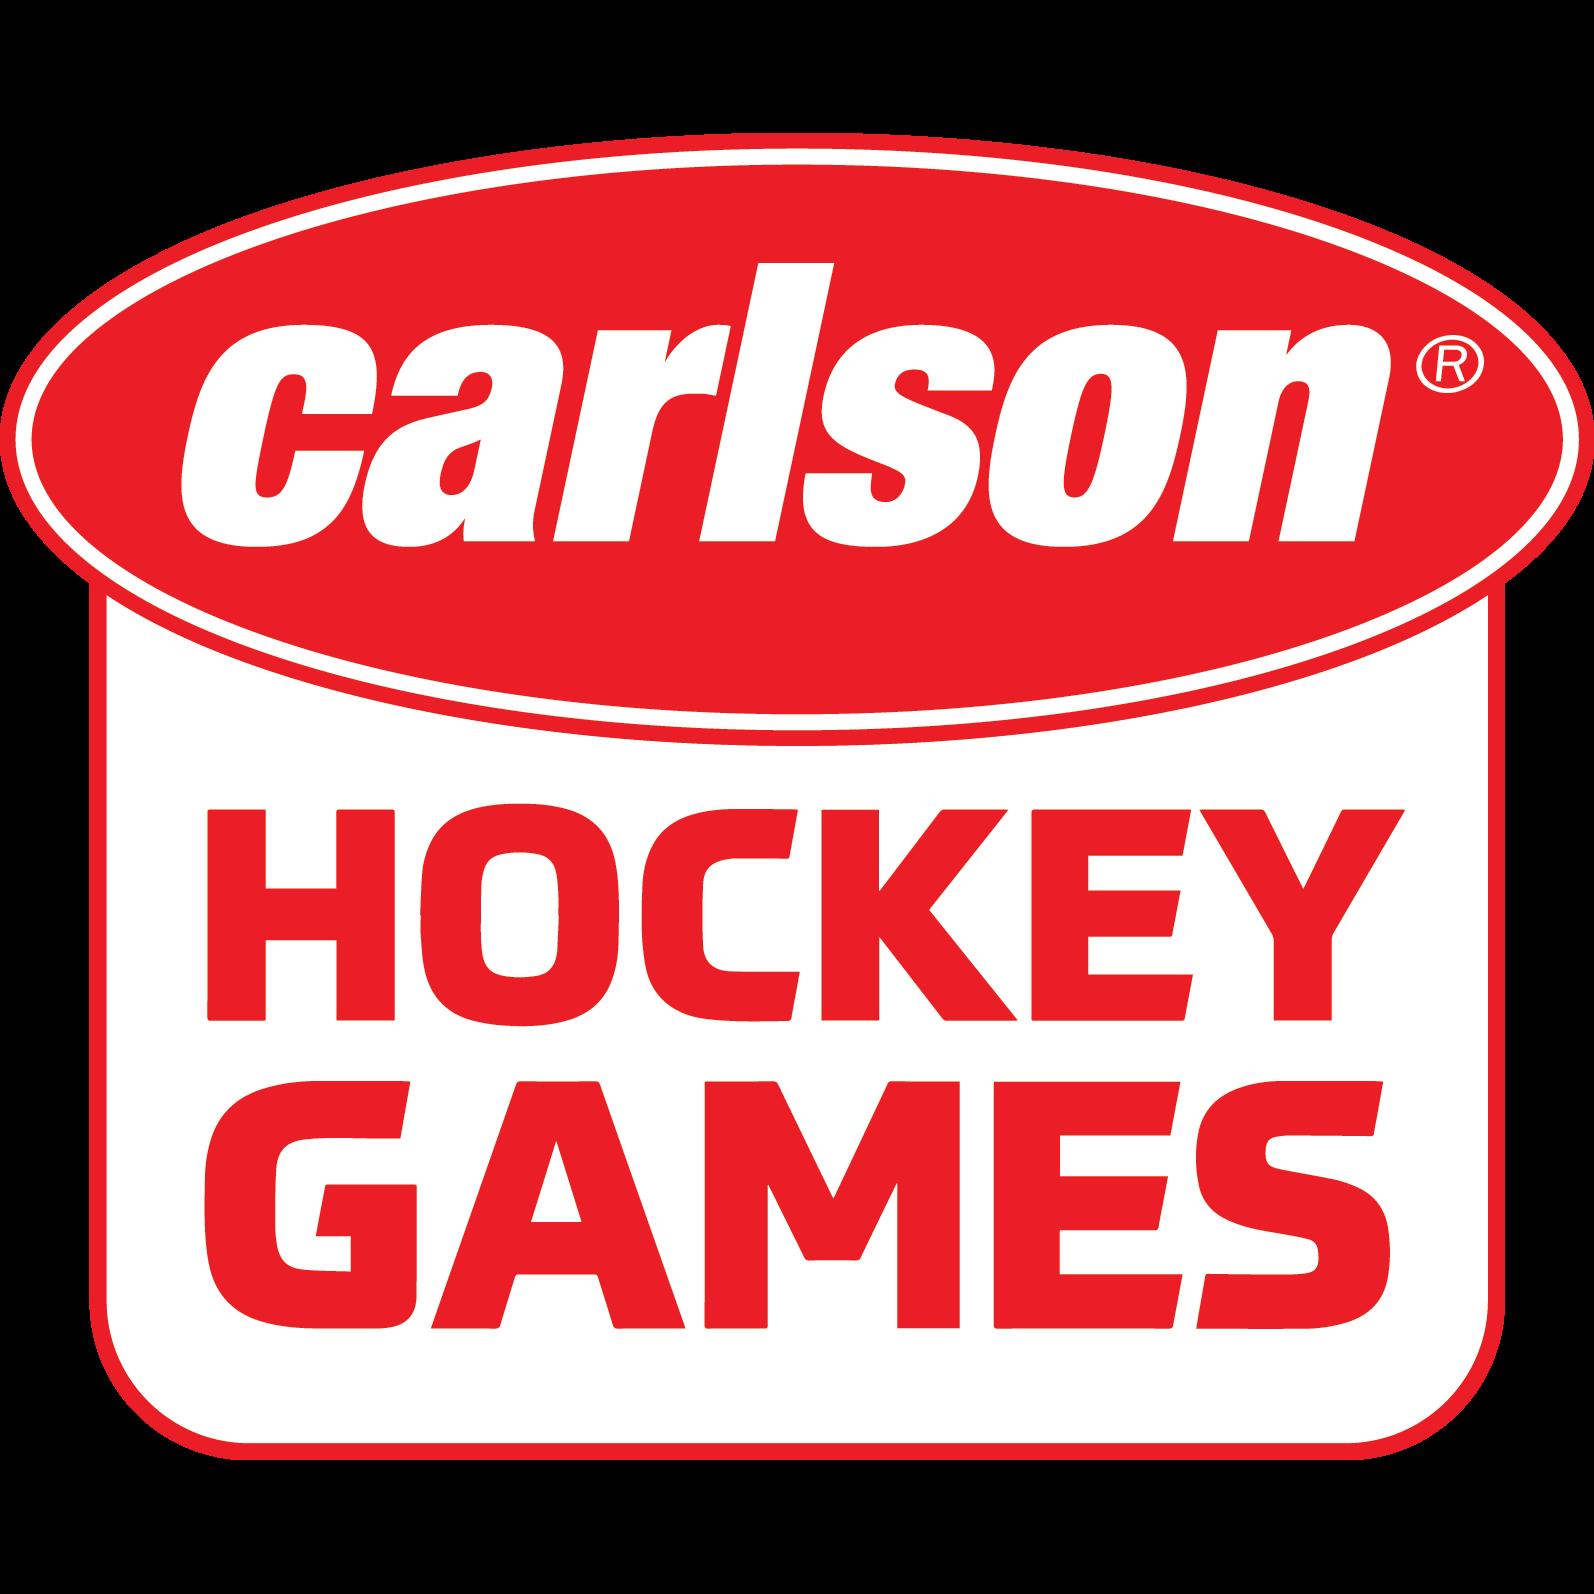 2021 Euro Hockey Tour - Carlson Hockey Games